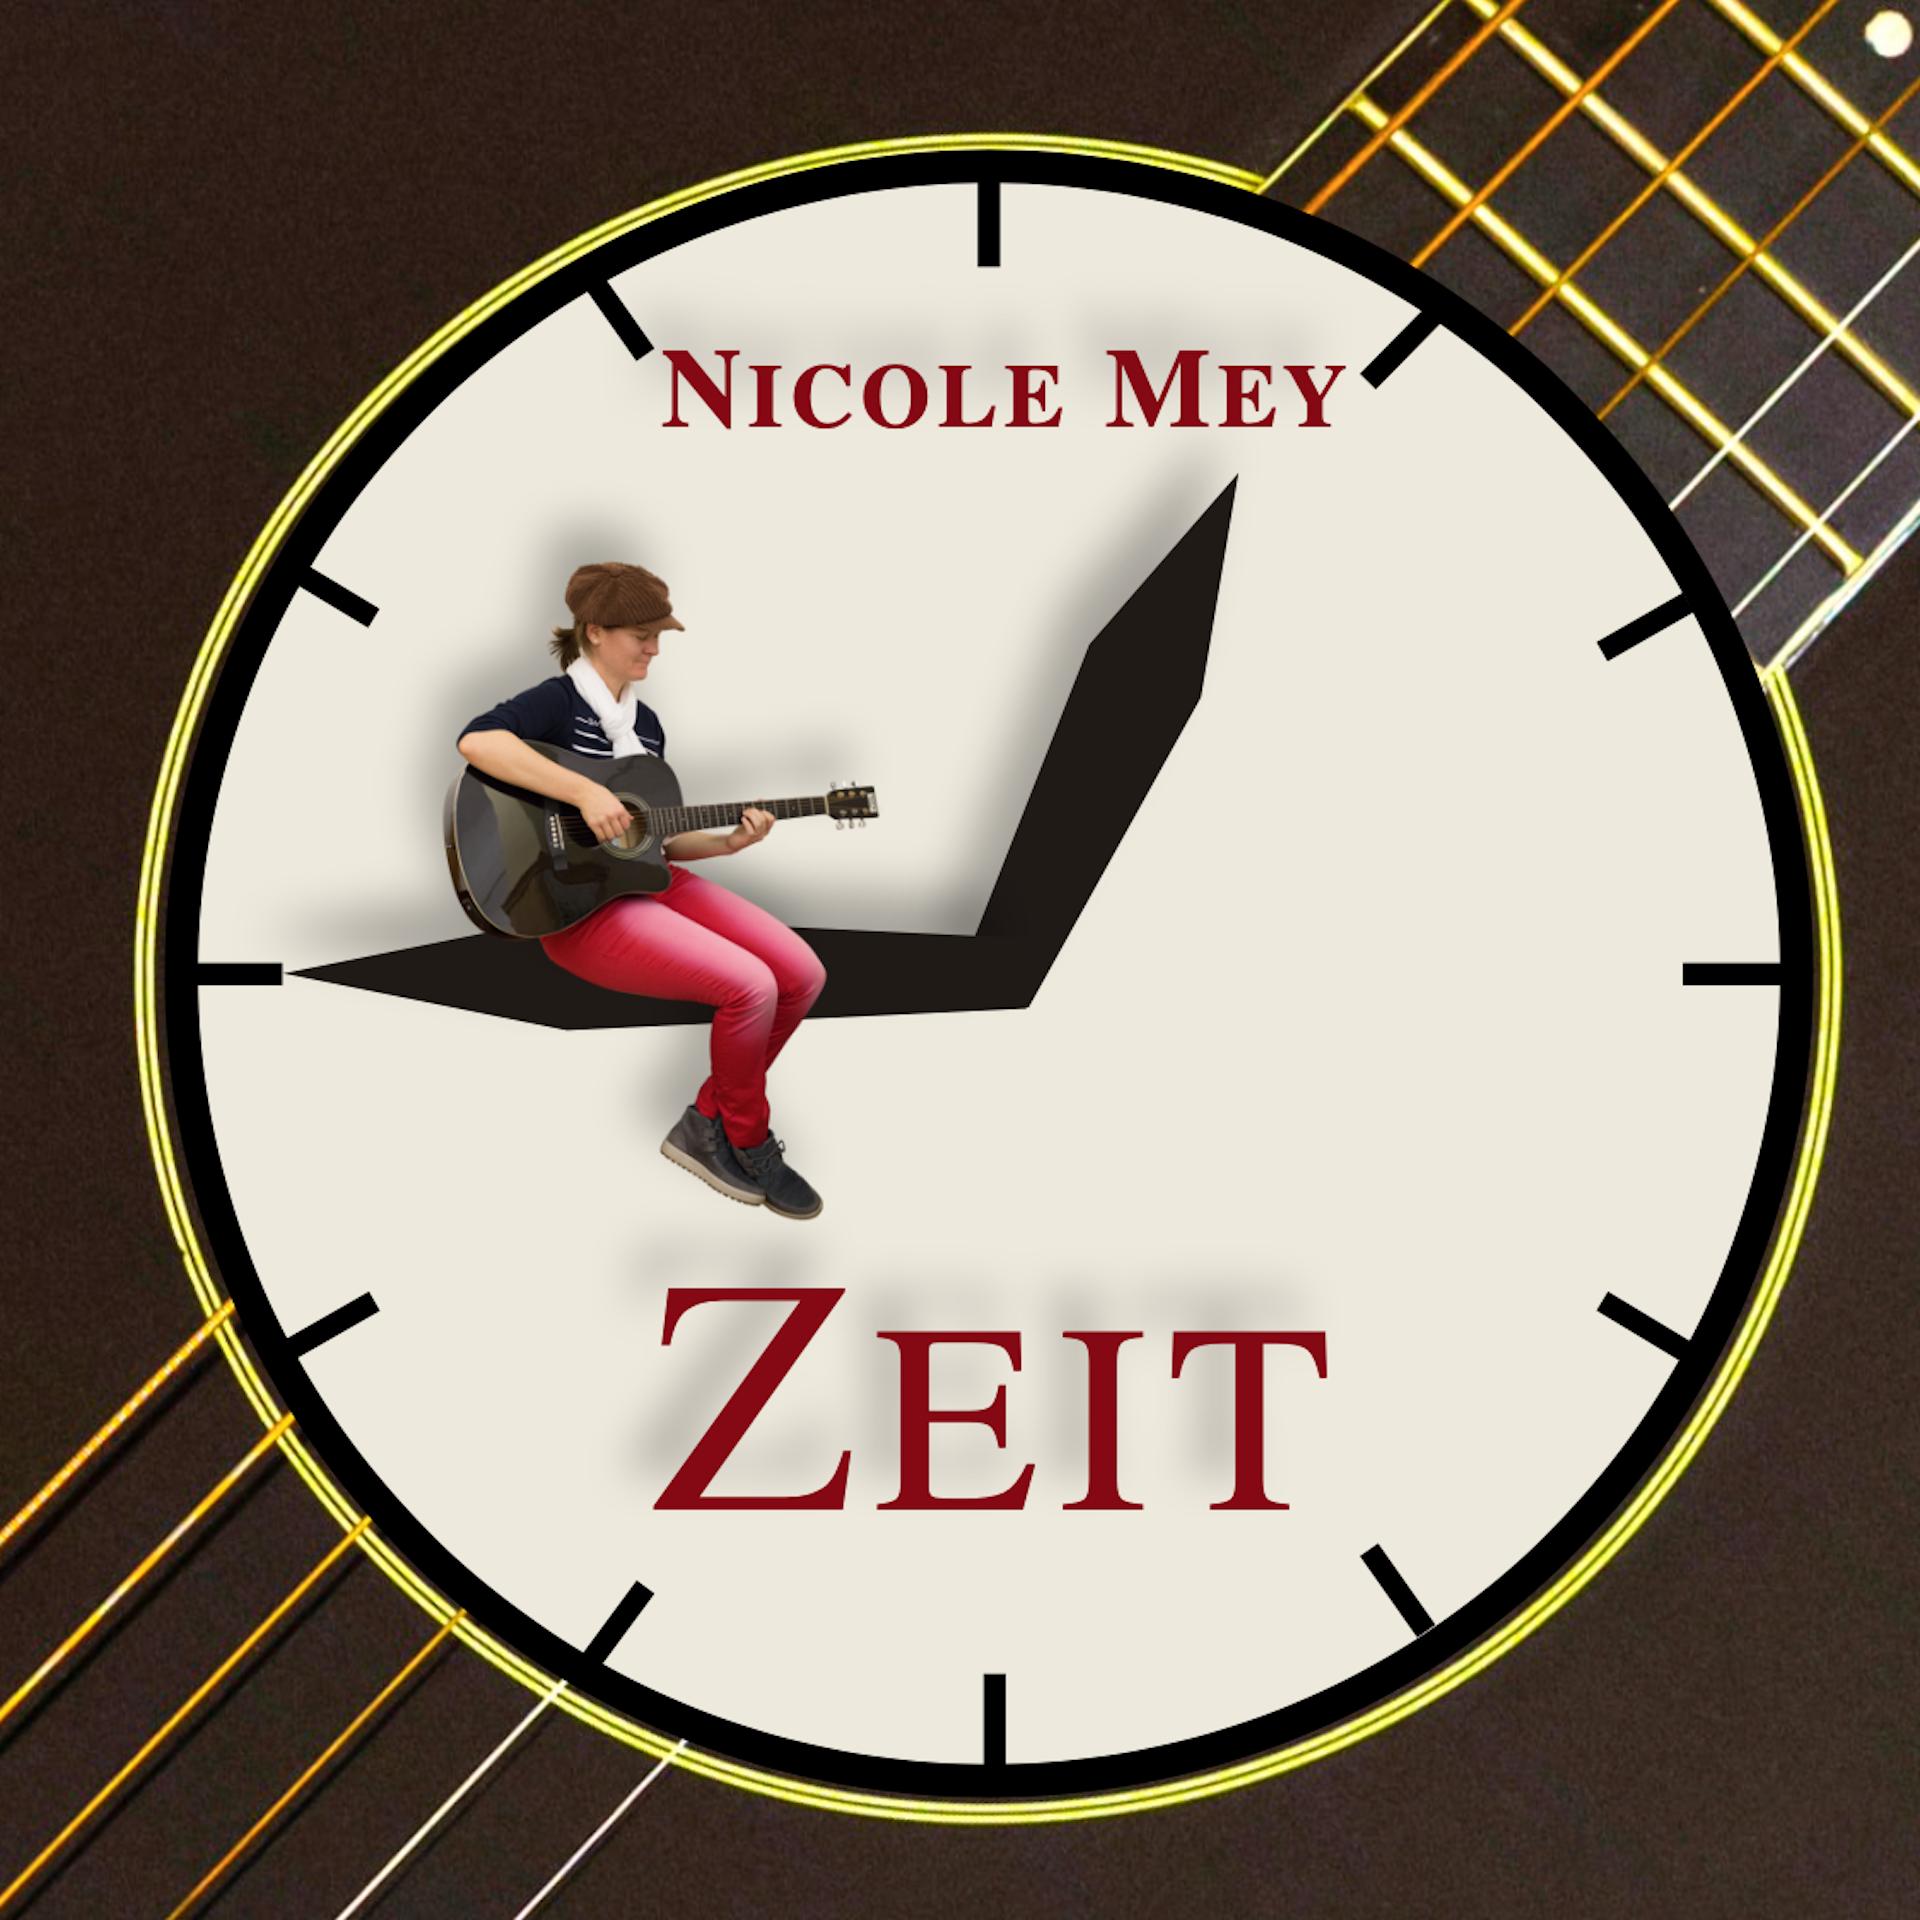 Zeit_NicoleMey